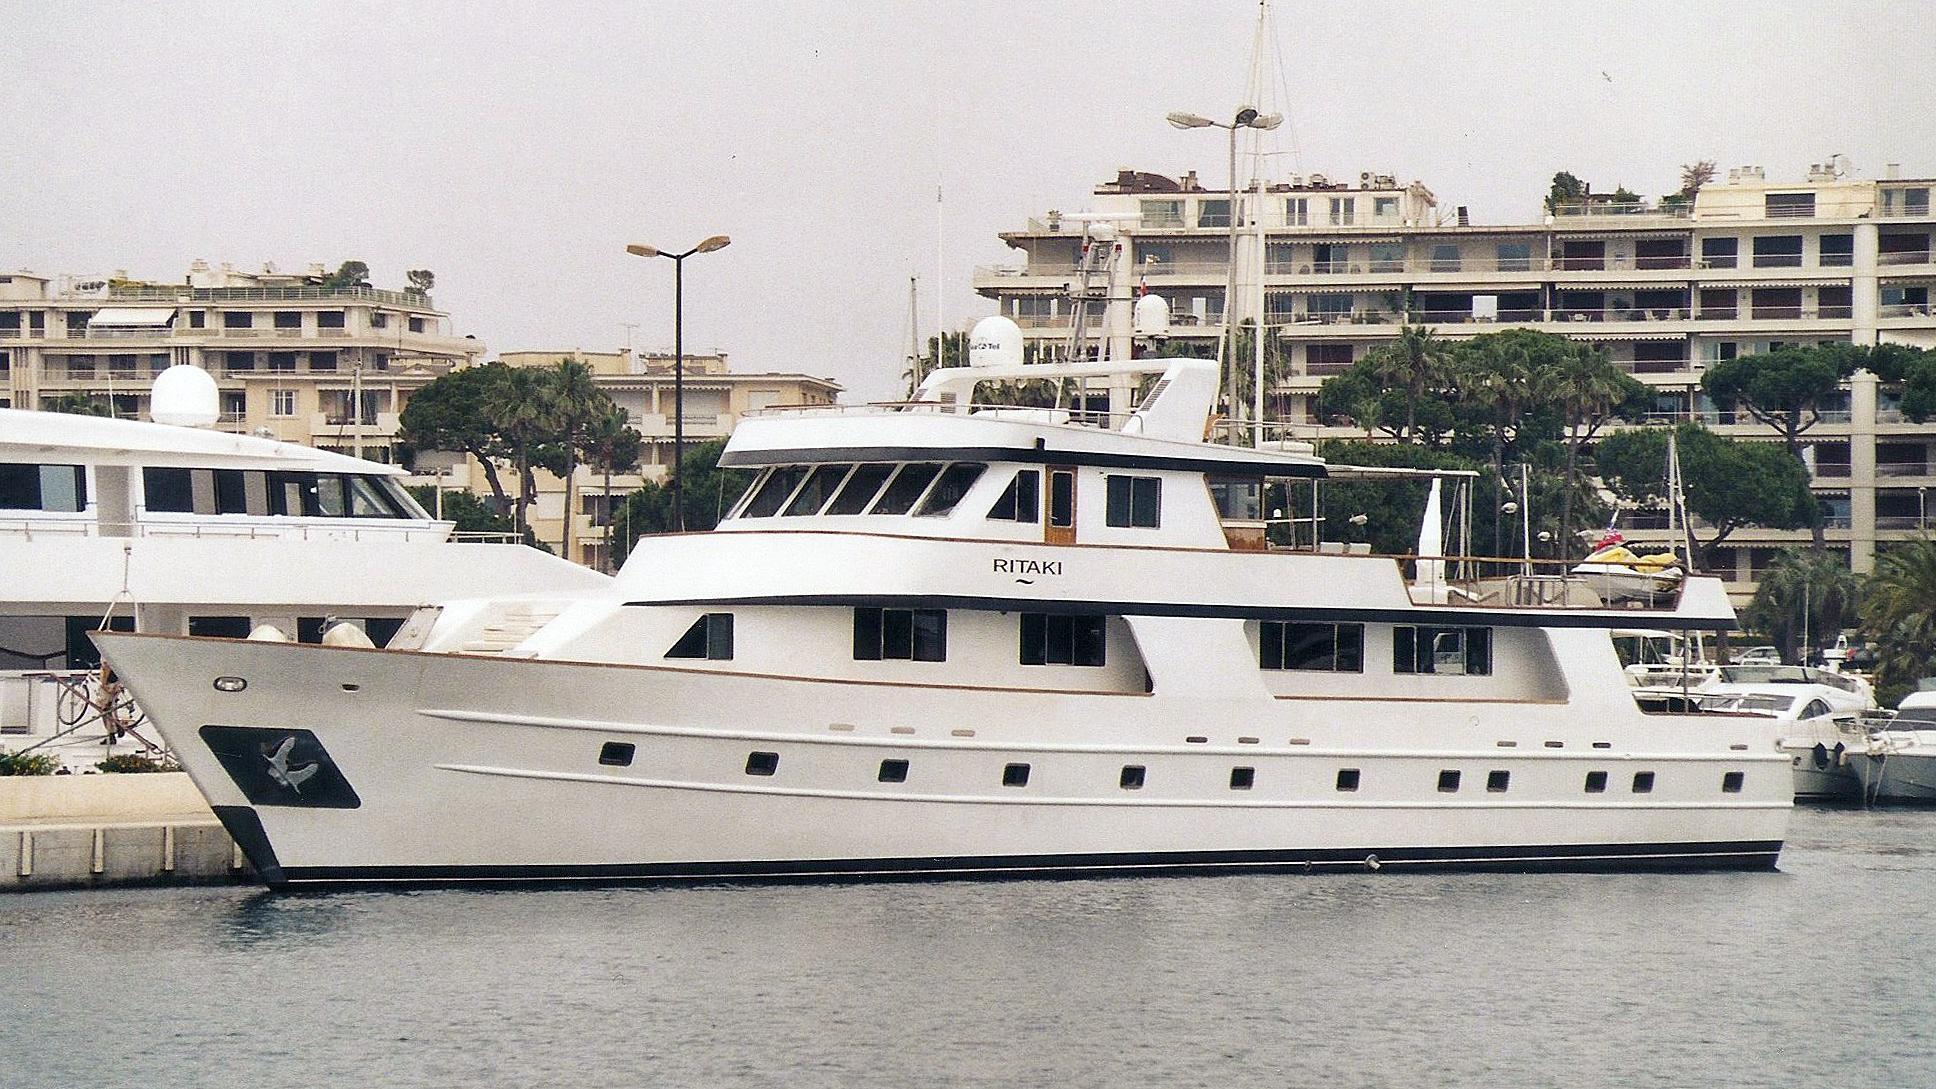 spirit of fortitude ritaki motoryacht karadeniz 1997 34m half profile